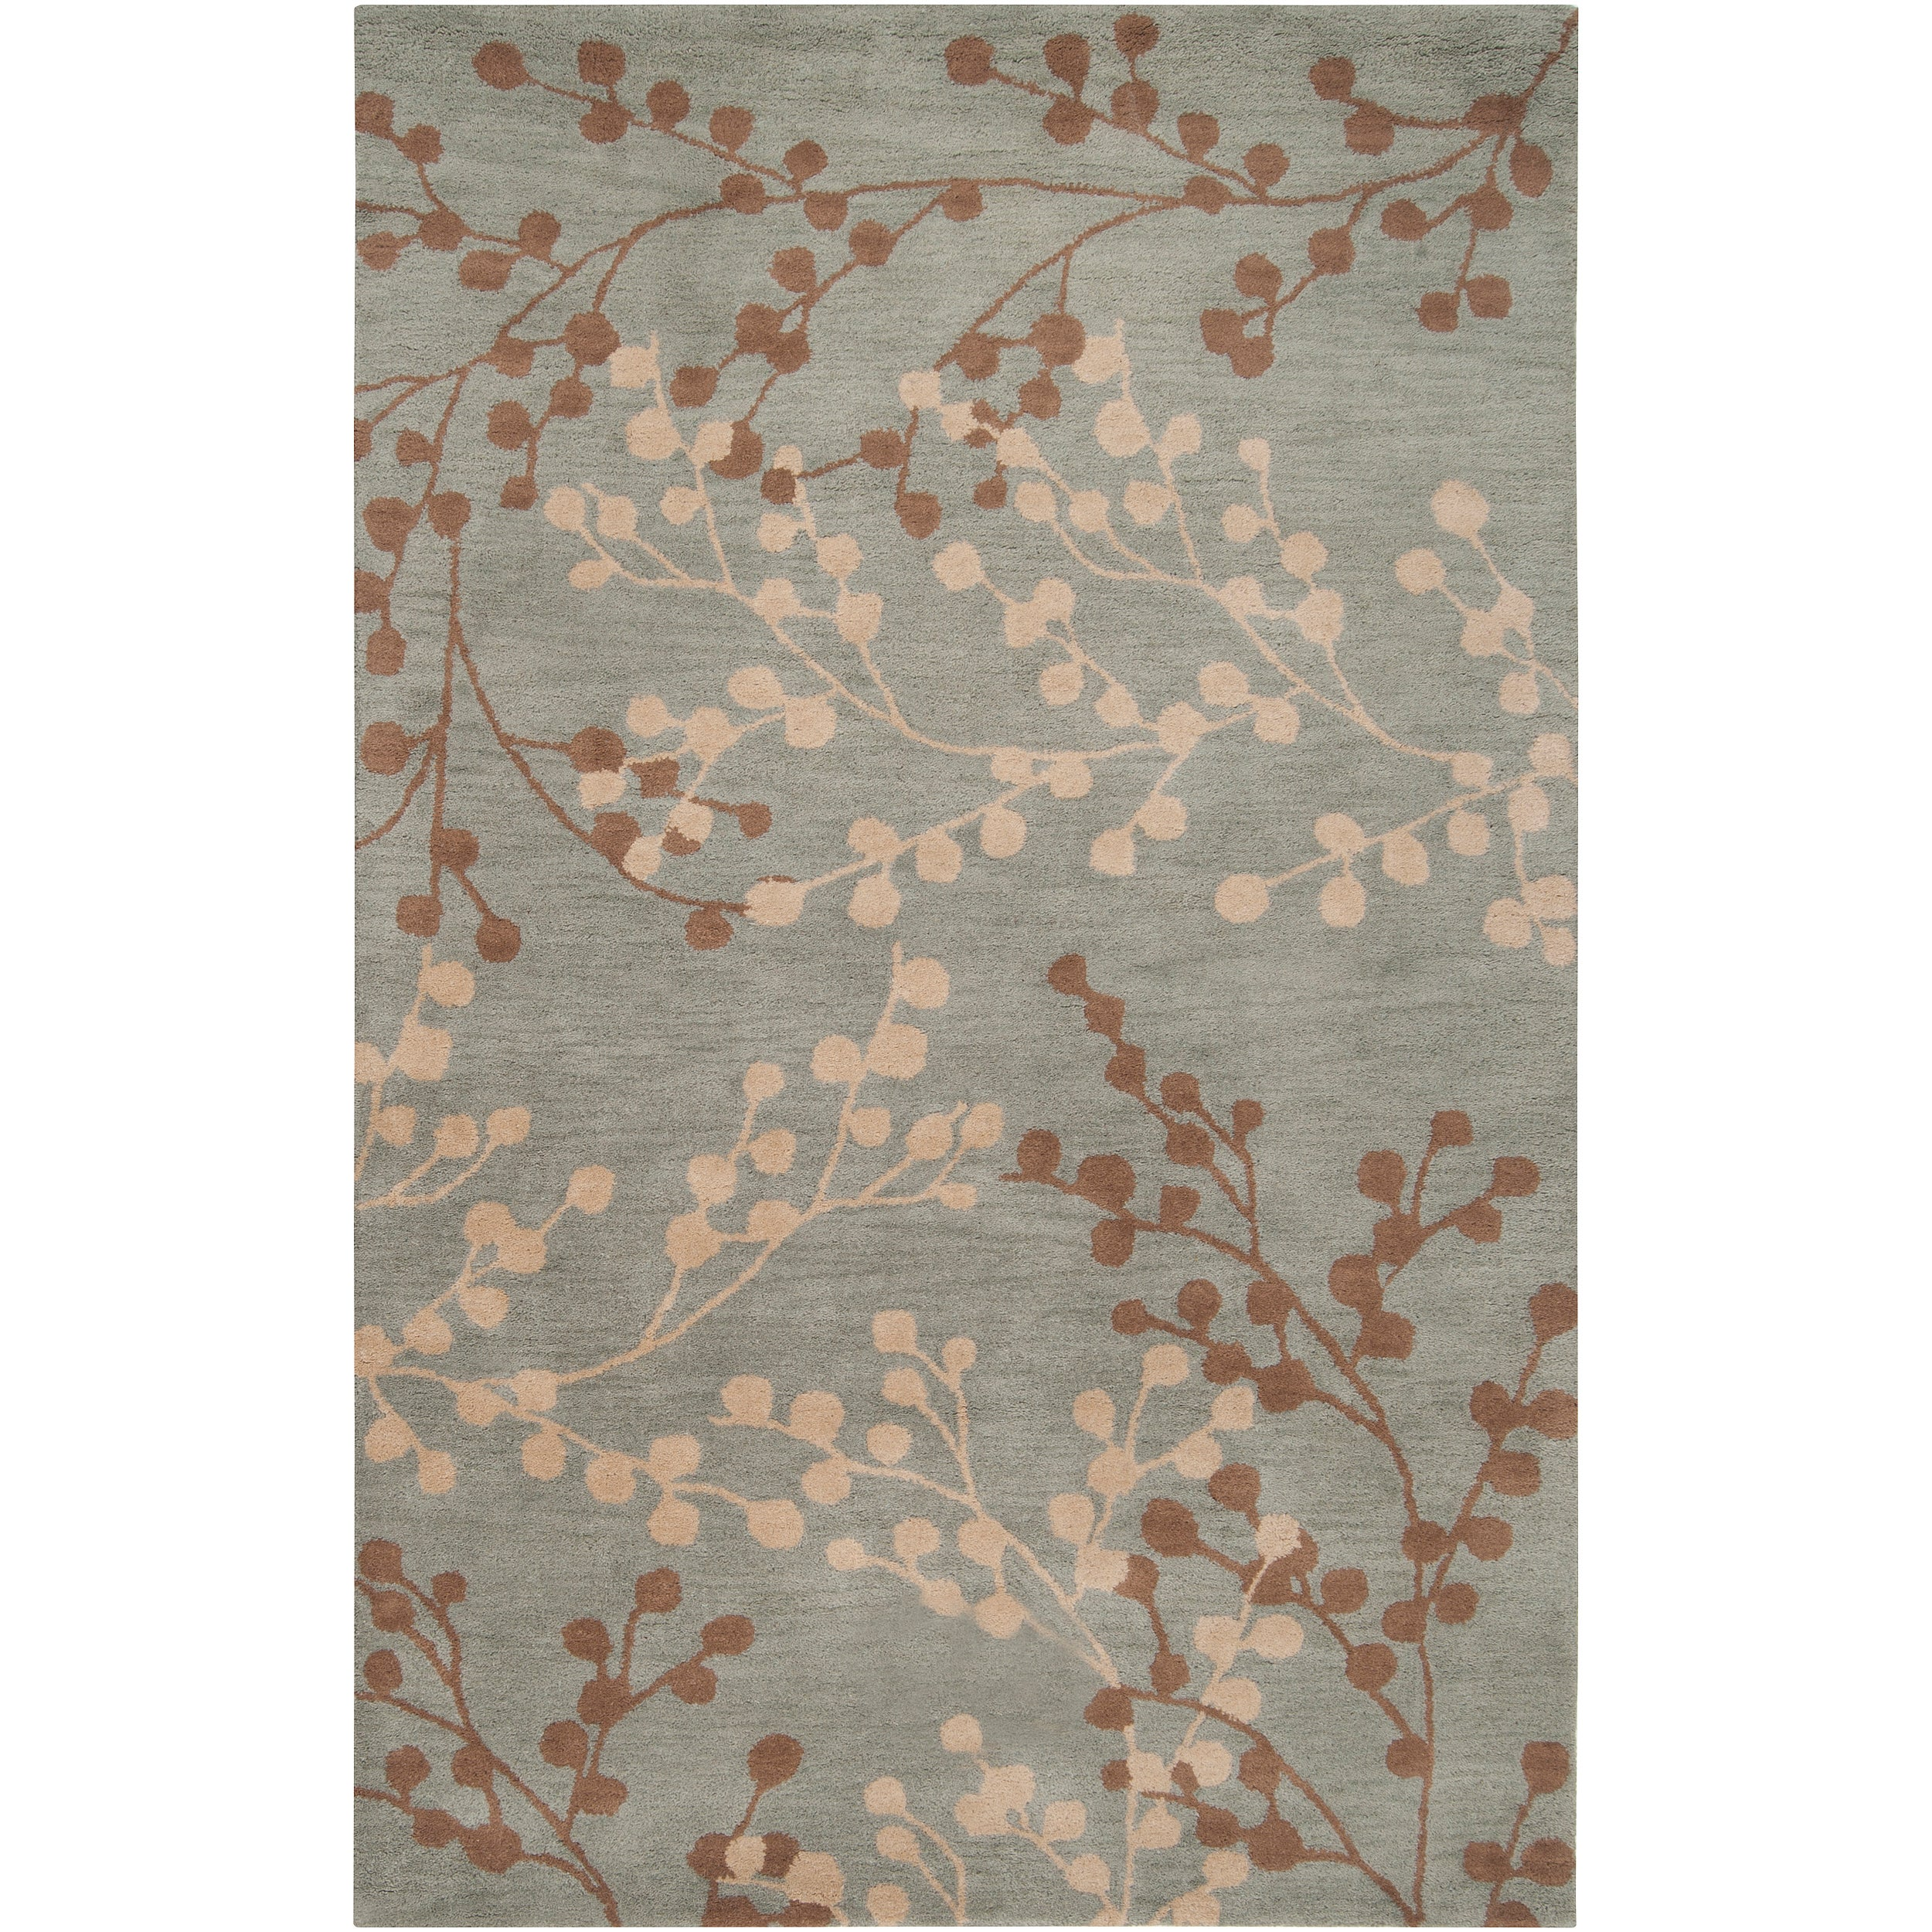 Hand-tufted Blossom Blue Wool Rug (3'6 x 5'6)